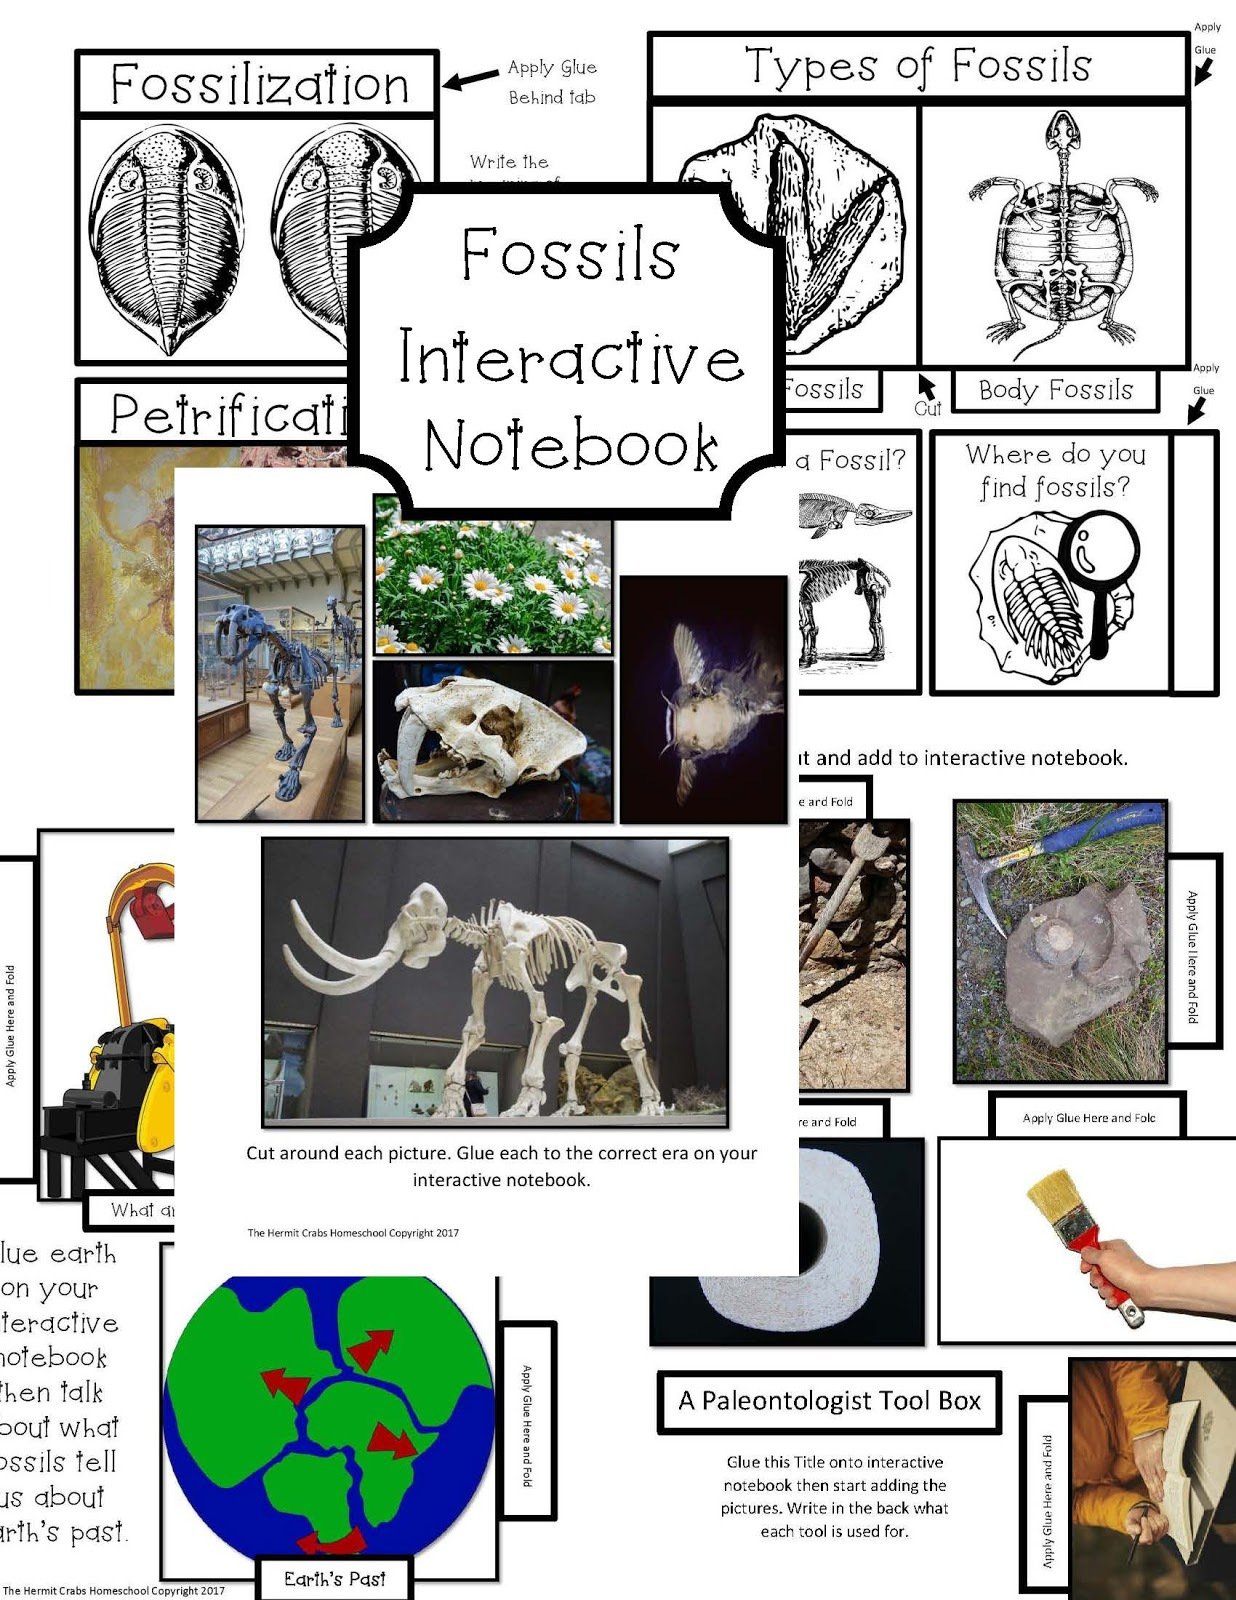 The Hermit Crabs Homeschool Fossils Unit Study